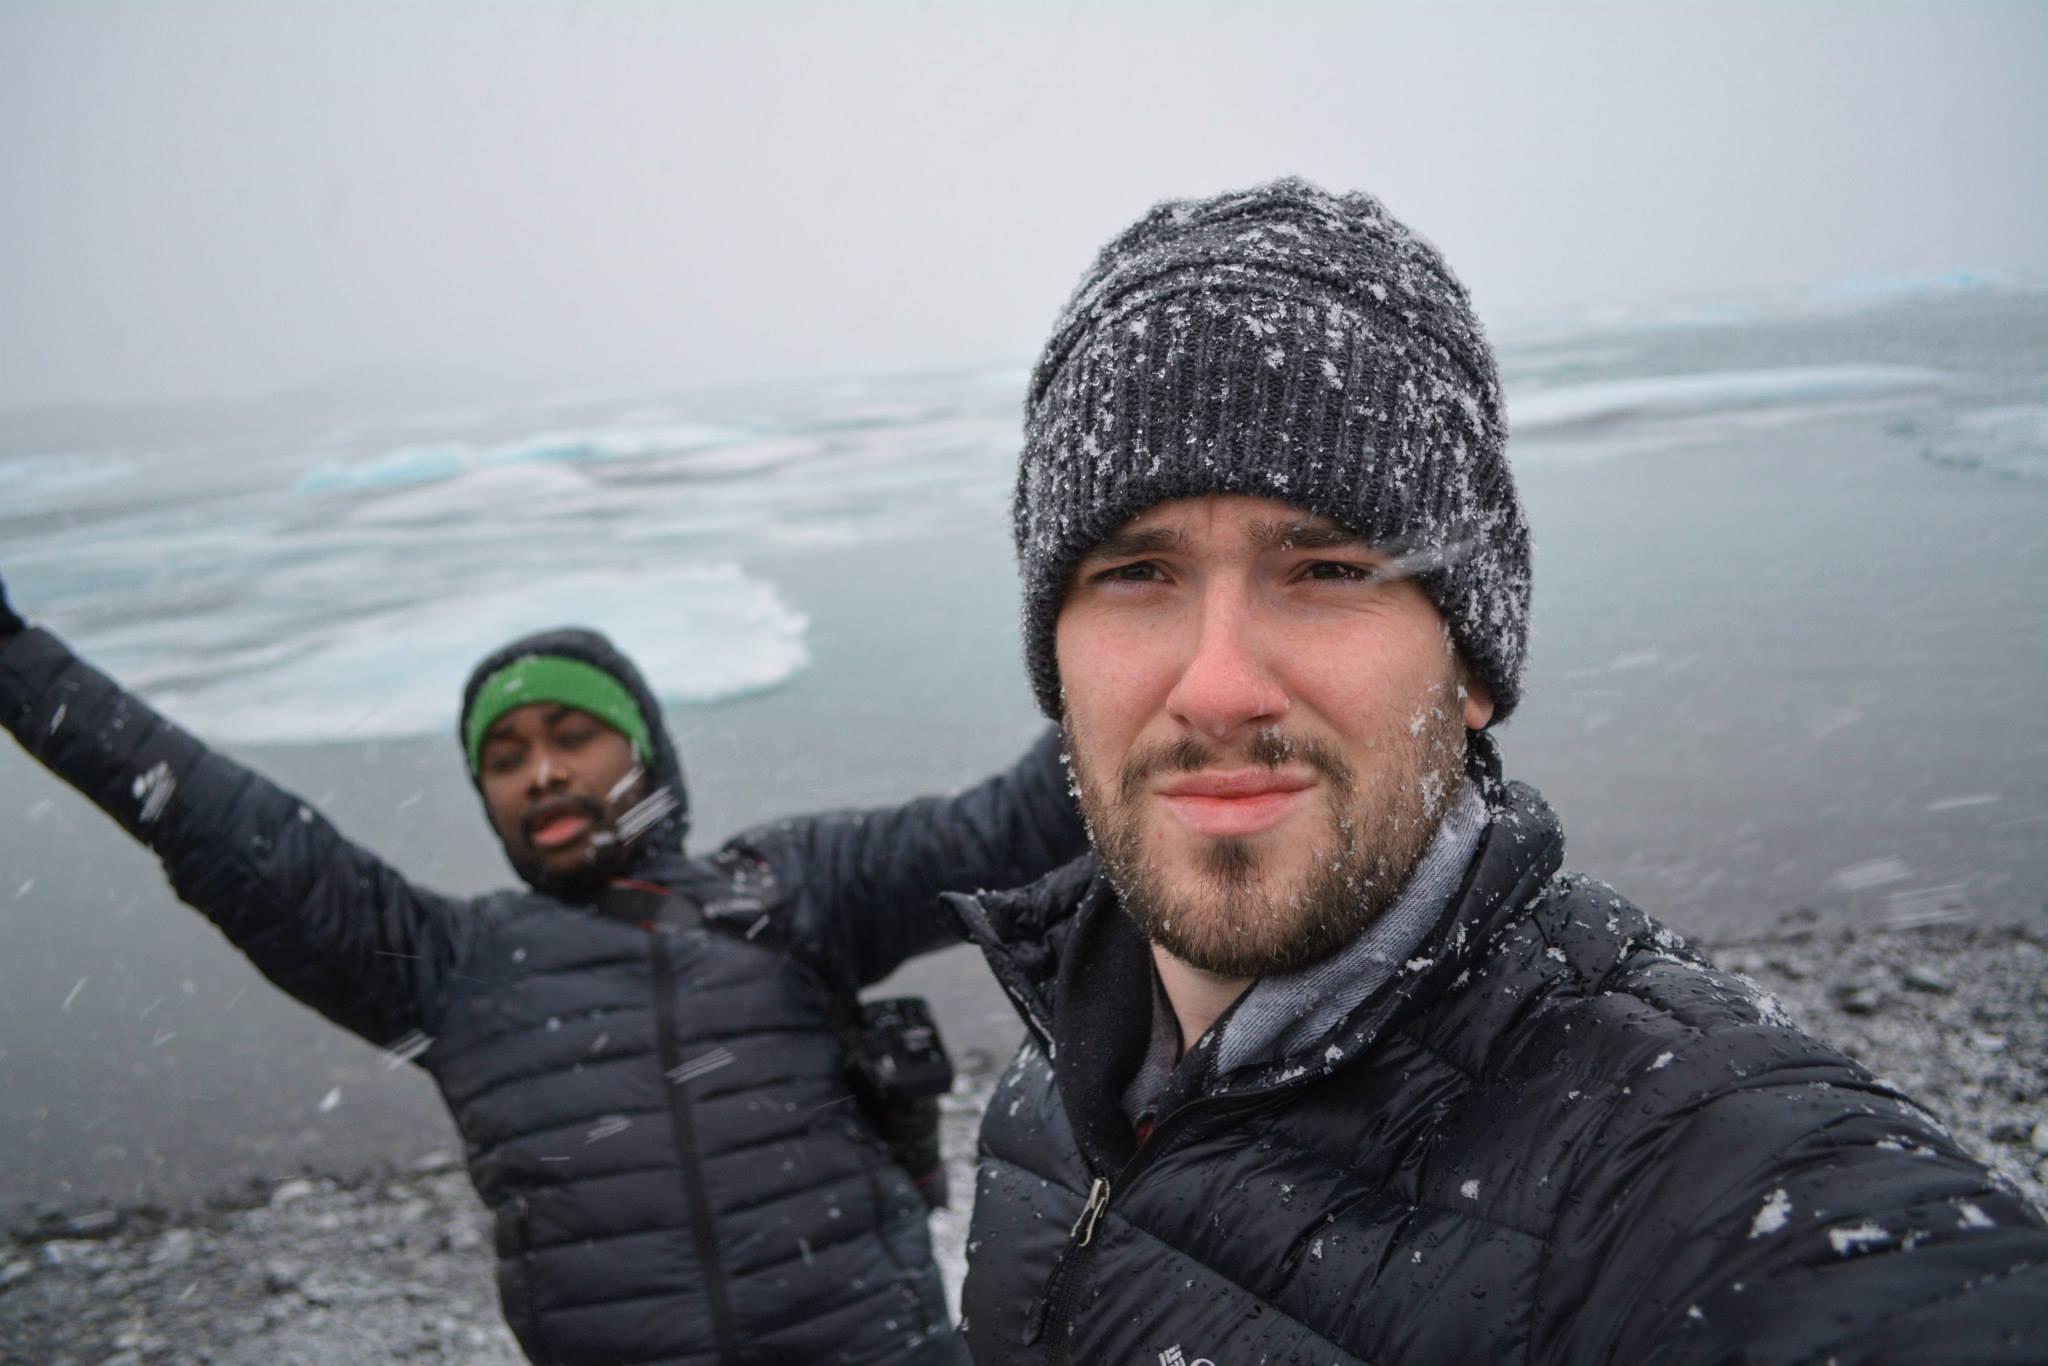 Lloyd and Yaya at Jökulsárlón - The Glacier Lagoon in Iceland